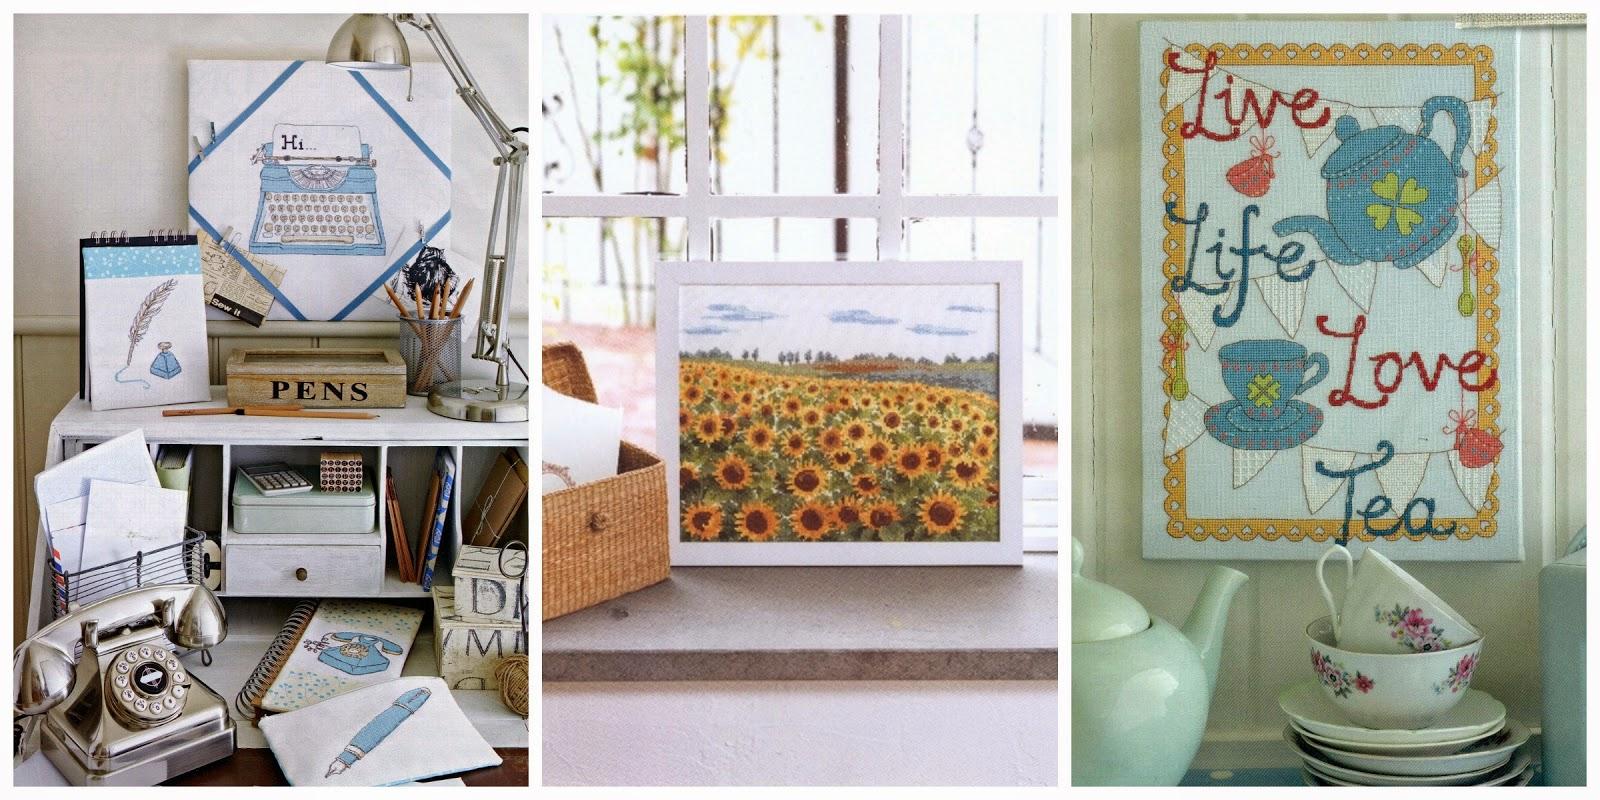 intererkollazh - Вышивка и вязание в интерьере квартиры